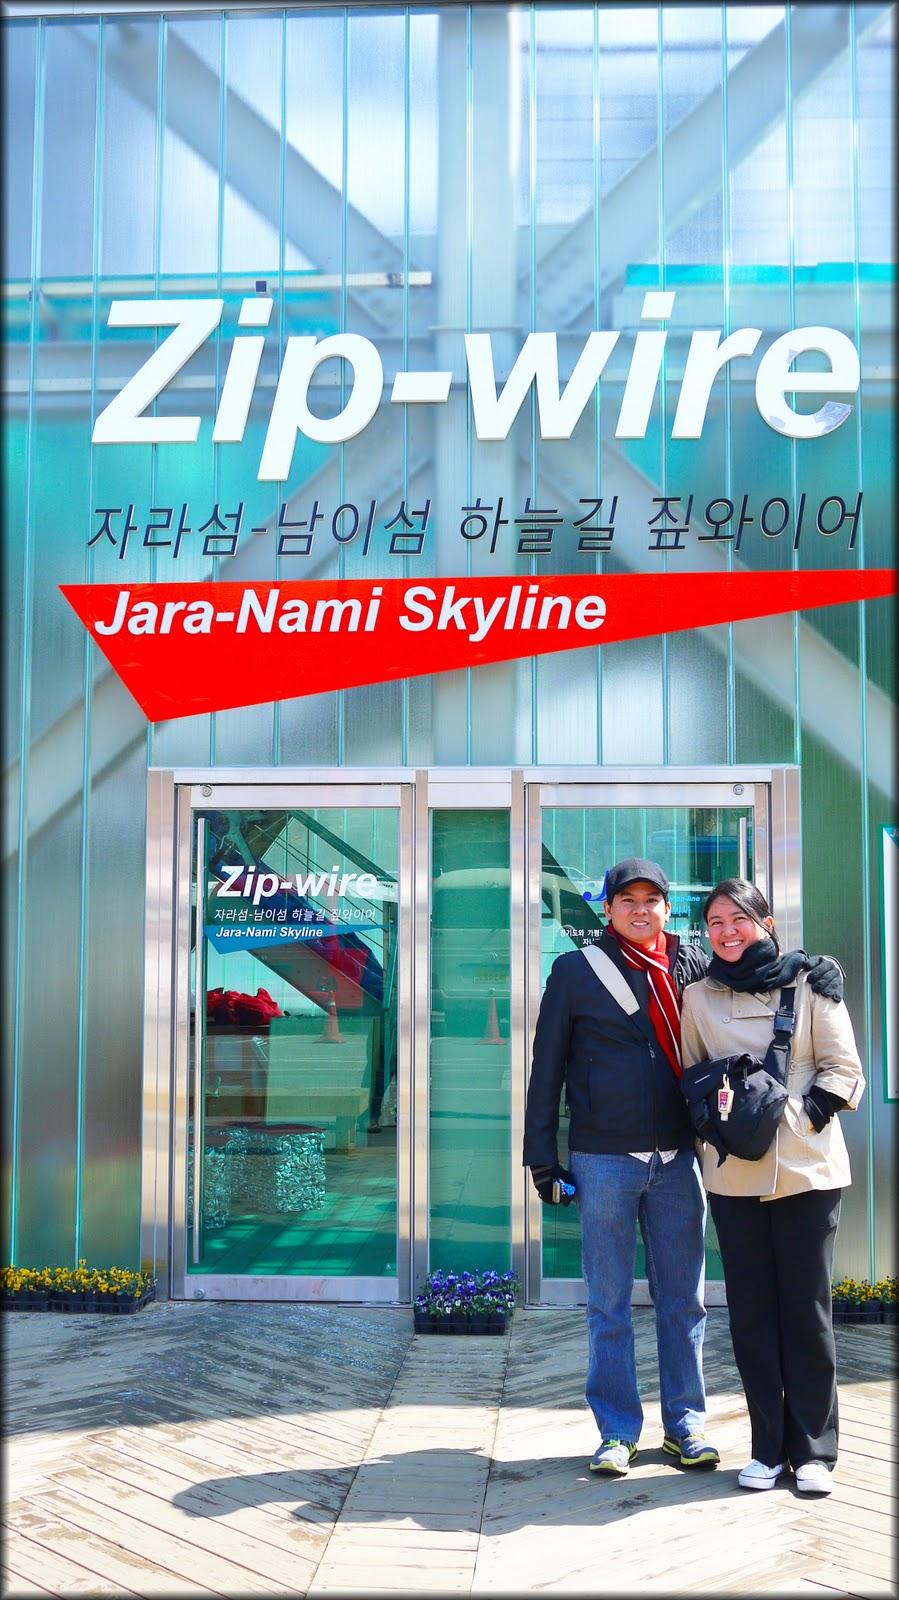 Kris and Ria visit Korea 2011: Zip Line from Gapyeong to Nami Island